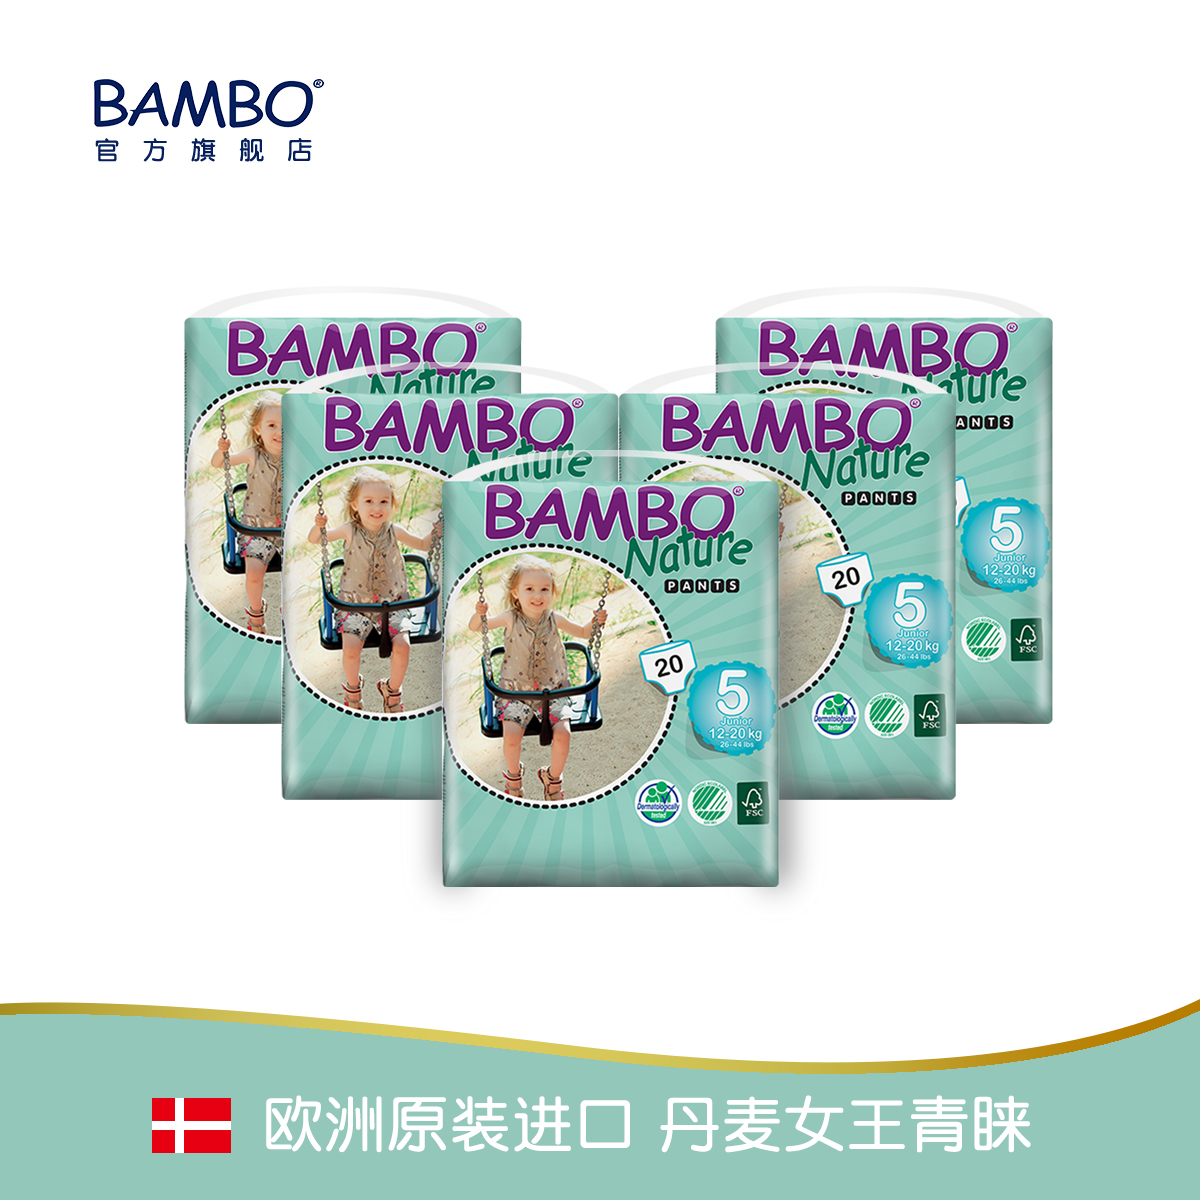 BAMBO拉拉裤多少钱,好用吗